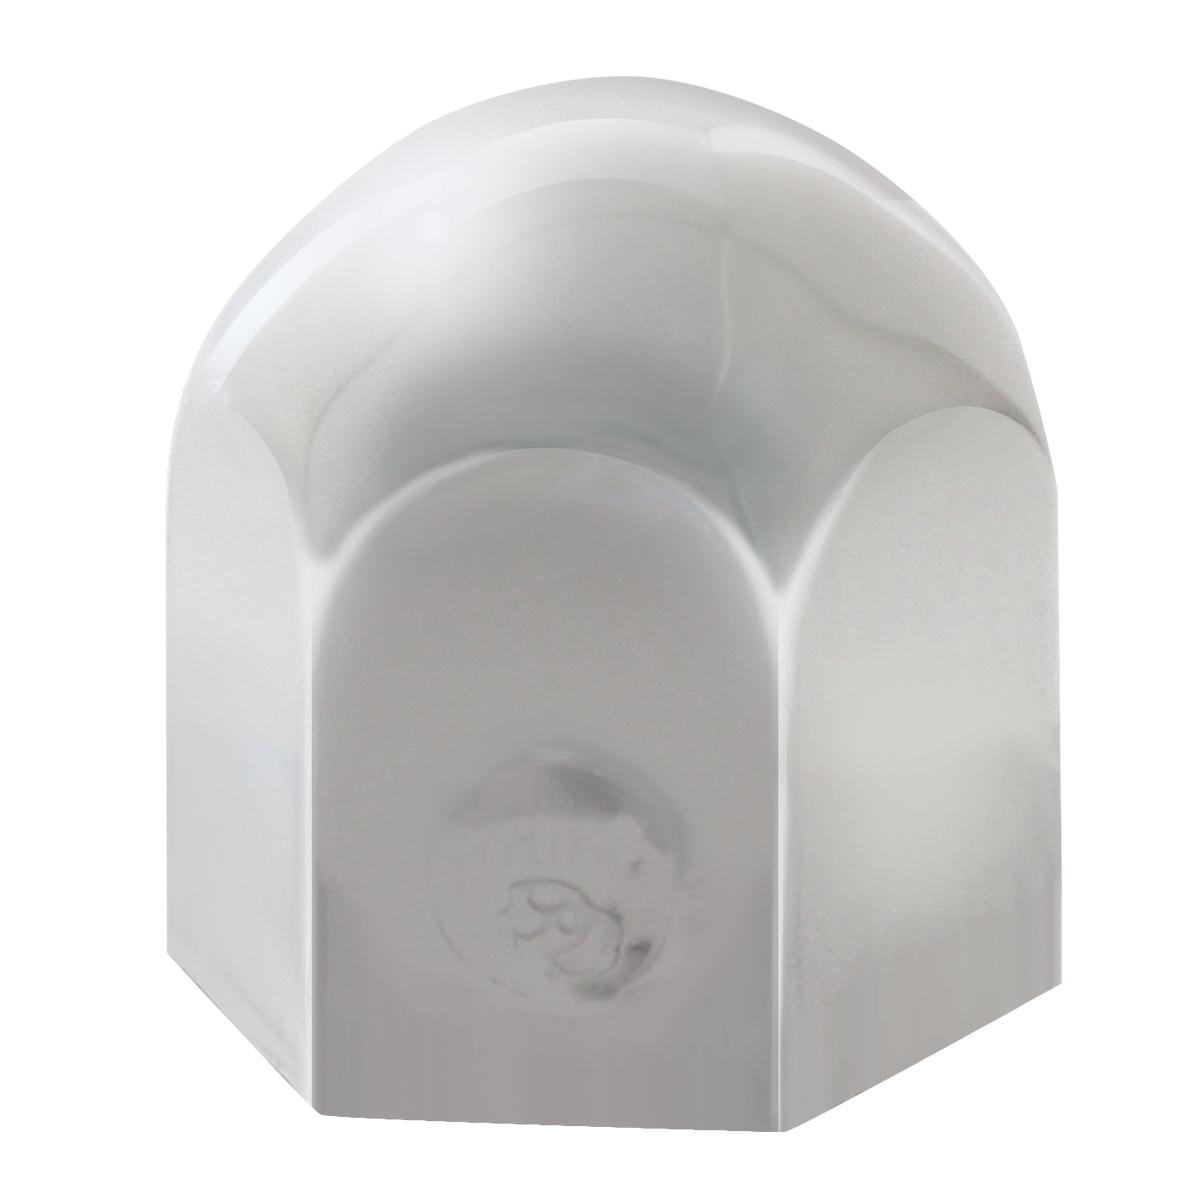 Chrome Push-On Standard Lug Nut Cover w/o Flange for Multi-Purpose